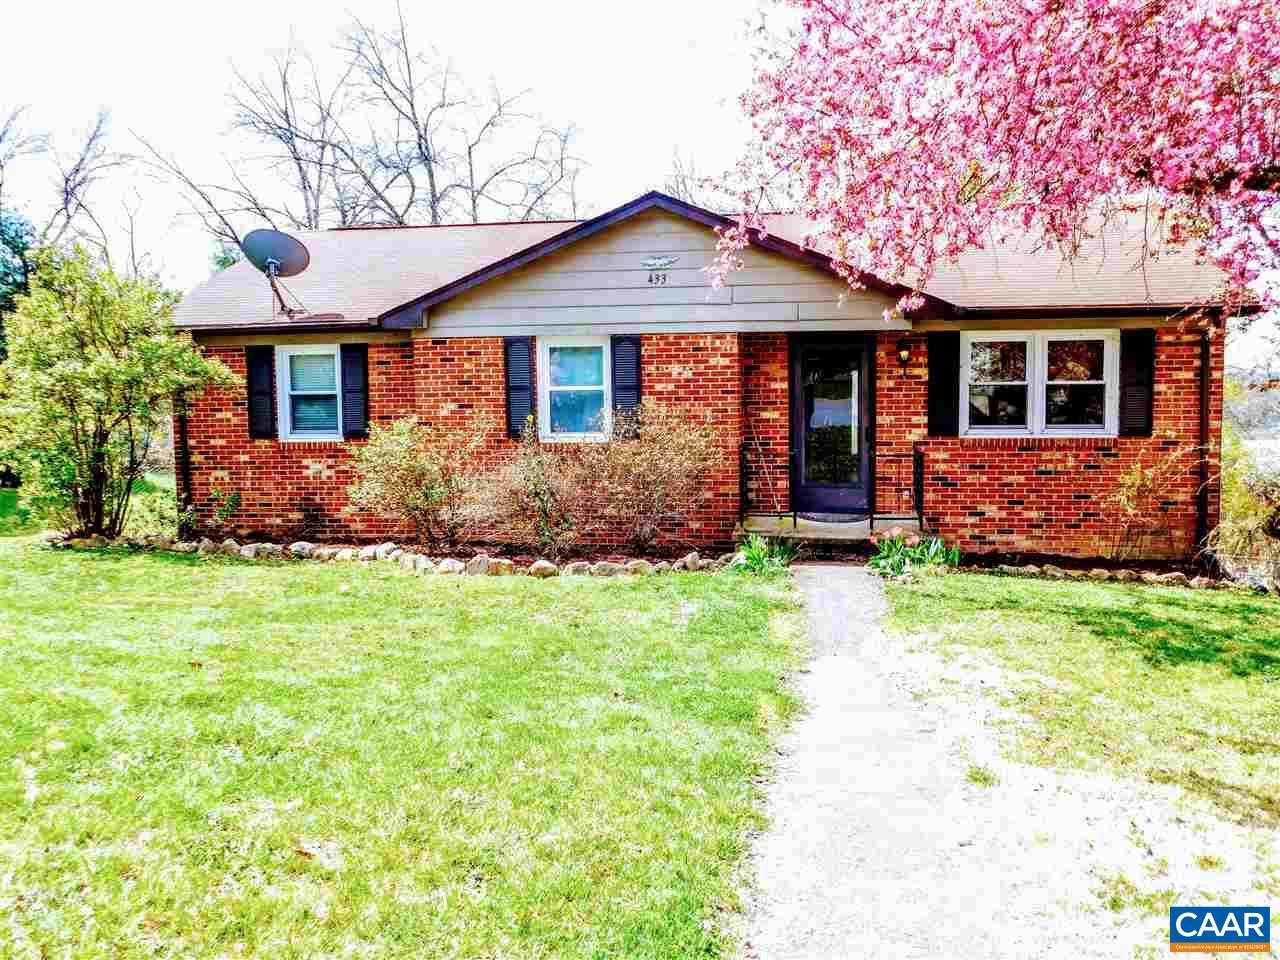 Single Family Home for Sale at 433 WOODLAND Circle Waynesboro, Virginia 22980 United States